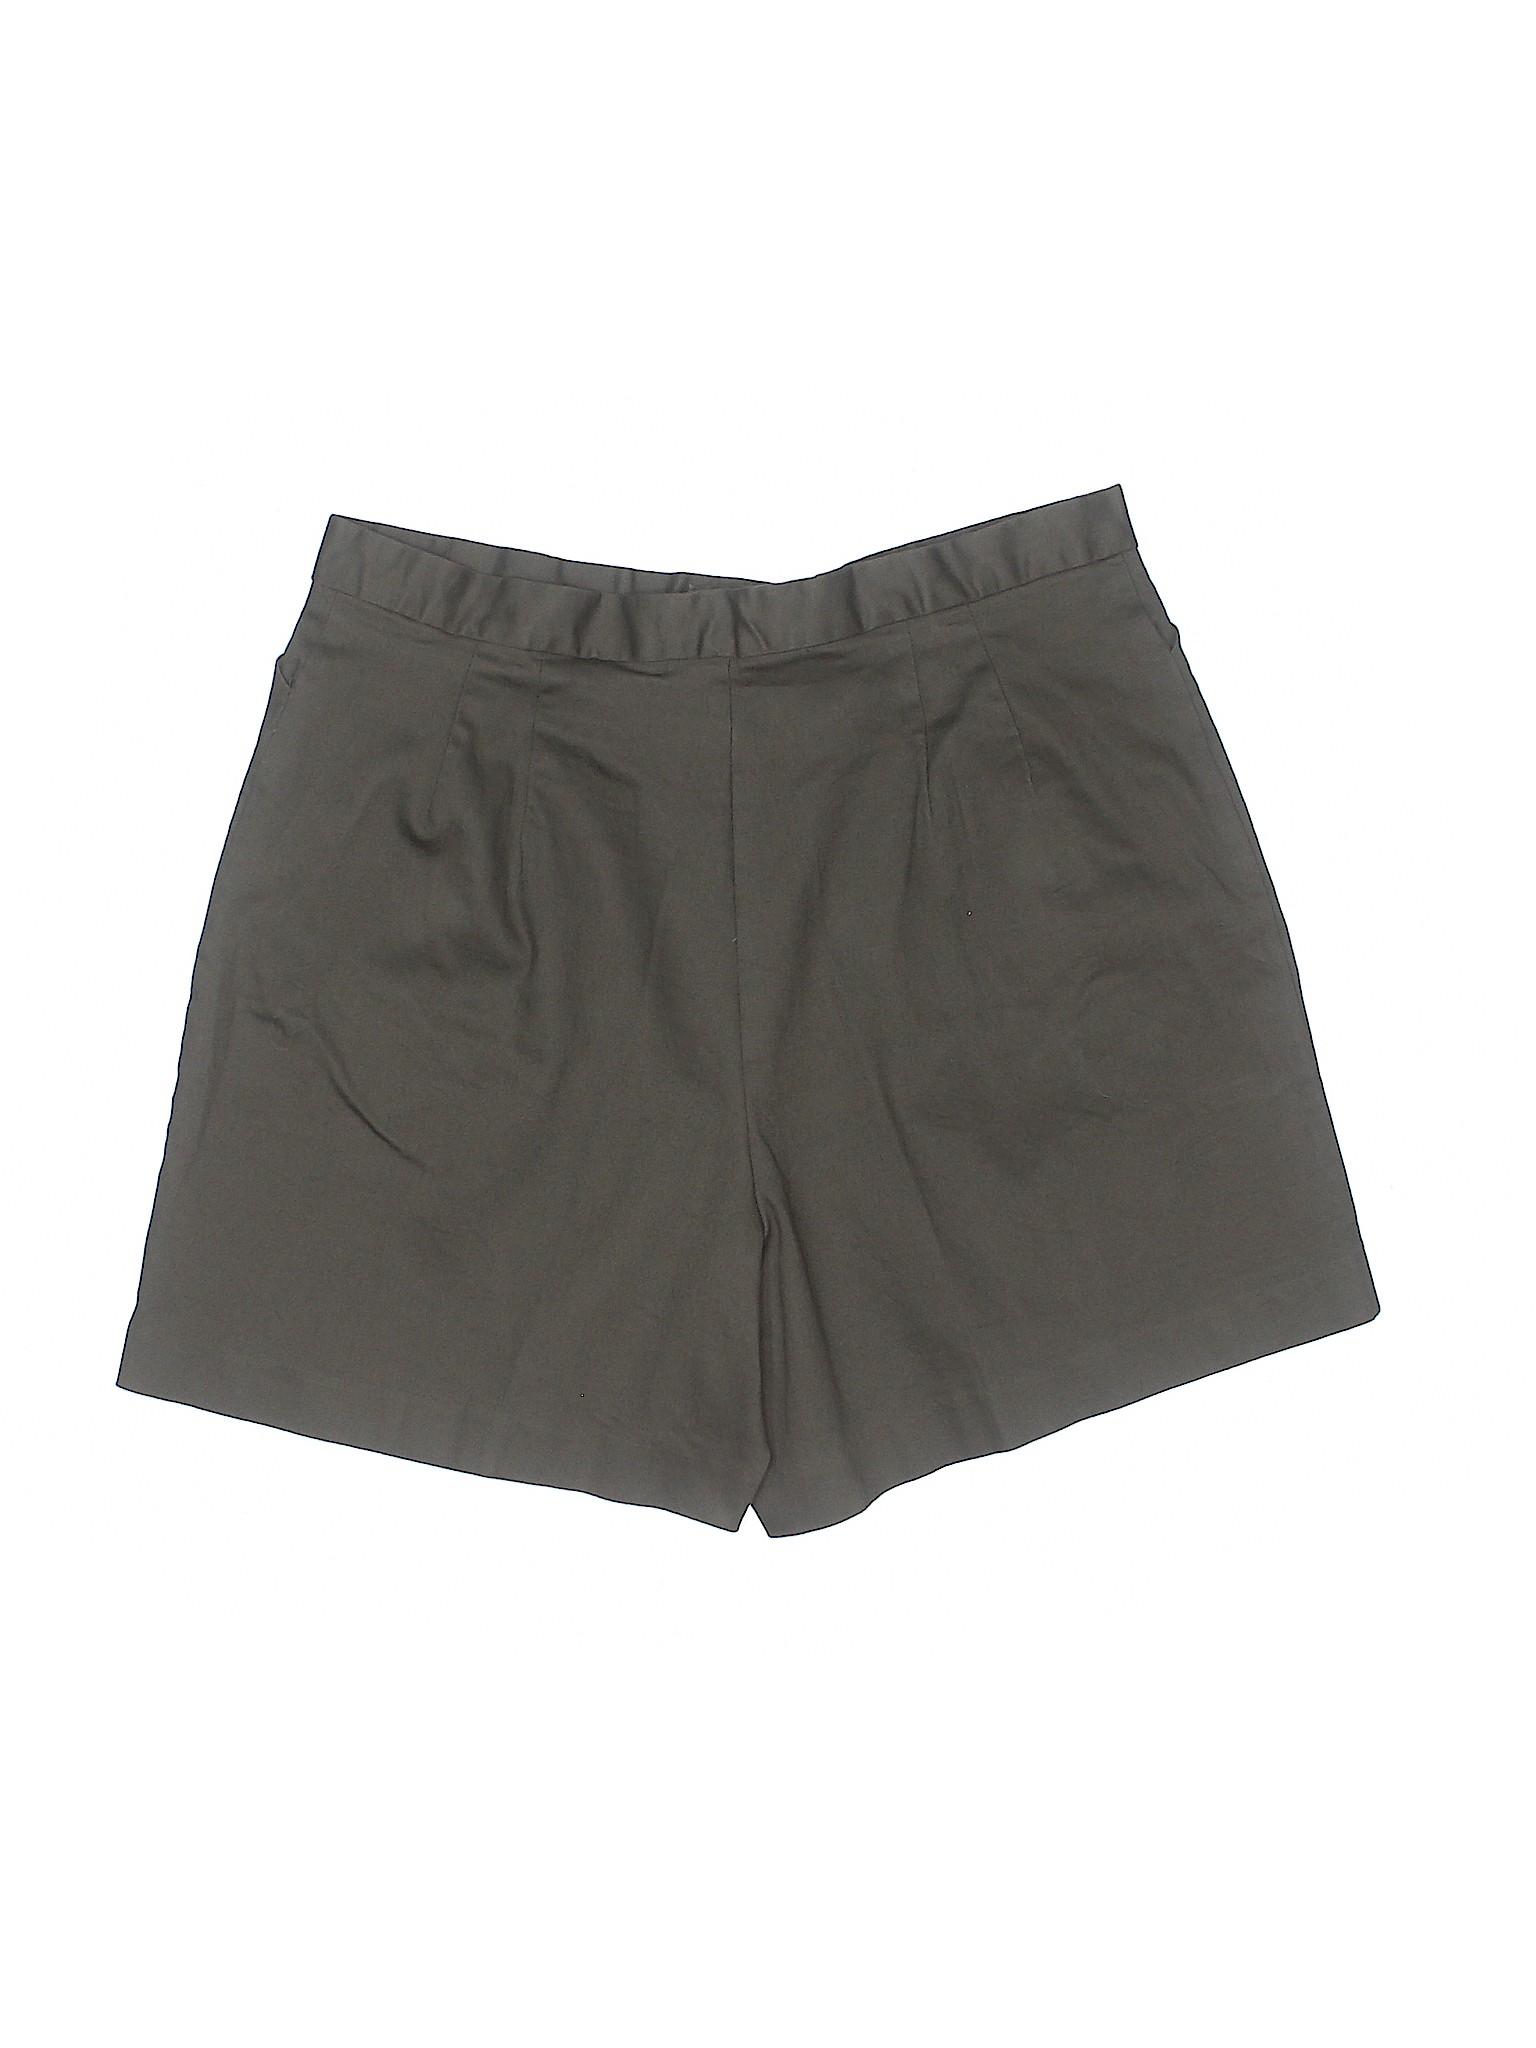 Boutique DressBarn DressBarn DressBarn Boutique Boutique Shorts Shorts DressBarn Boutique Shorts 6HBtq0